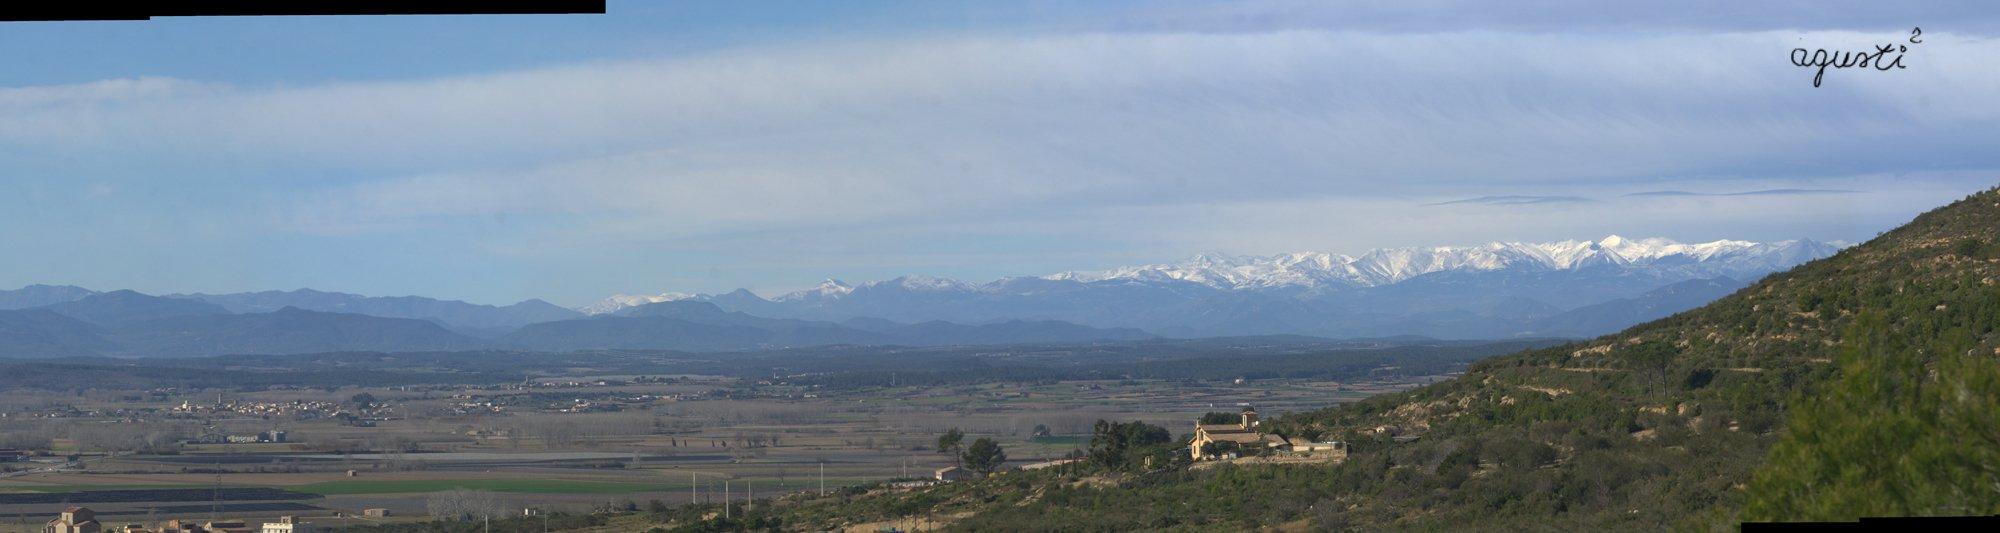 Panoramica El Pla, al fons el Canigo des de Castell Montgrí